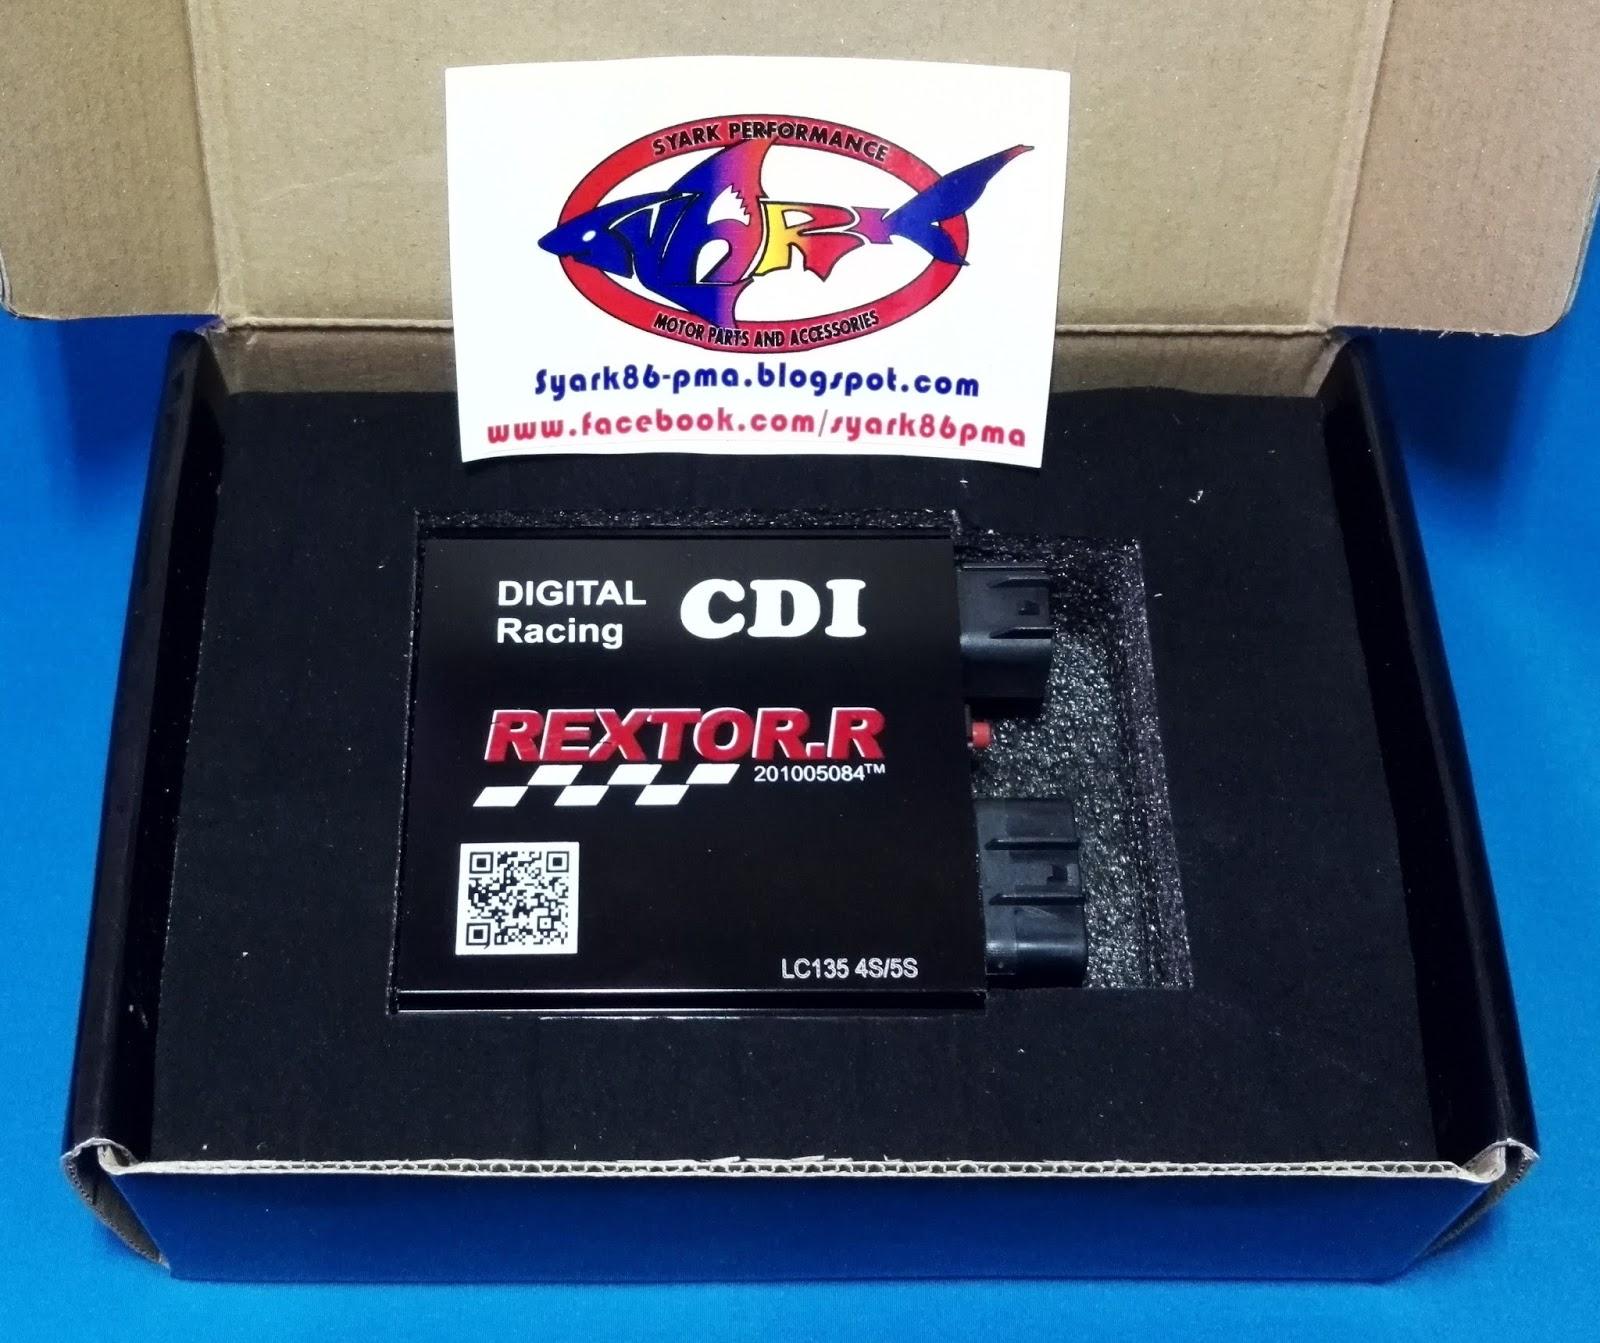 New REXTOR.R Racing CDI Unit (Digital - Adjustable) Yamaha 135LC/ Jupiter  MX/ Spark RX 135/ Yamaha 135LC ES/ Sniper MX 135/ Exciter 135/ Exciter RC/  X-1R